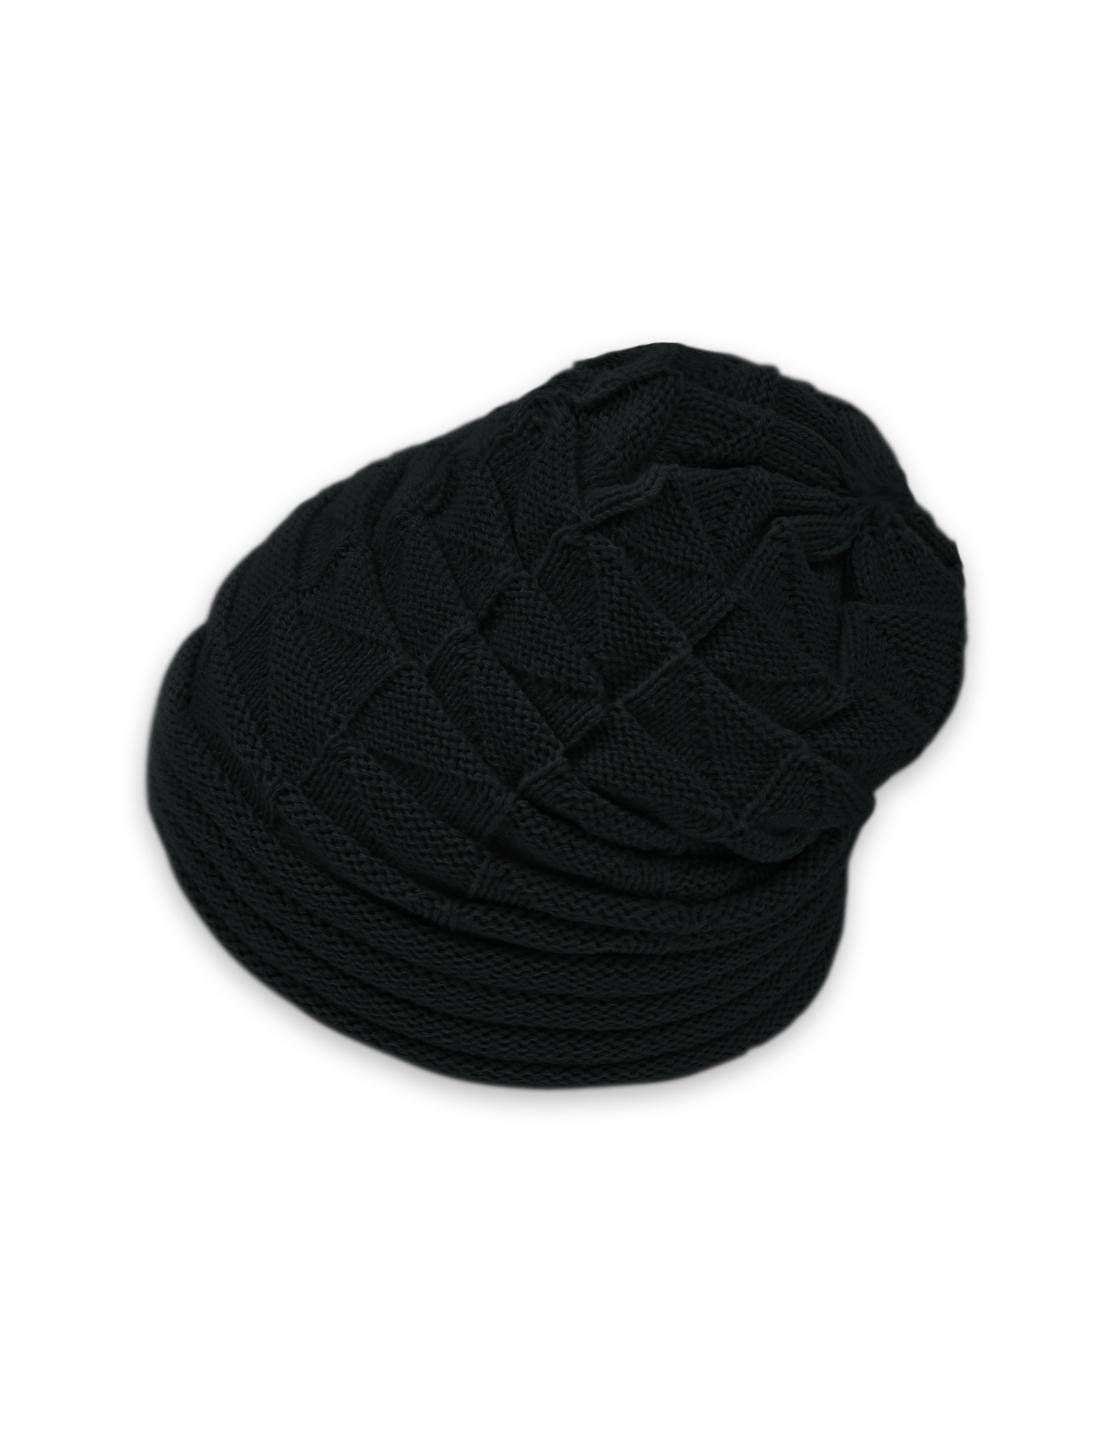 LZ079 Unisex Roll Up Hem Triangle Pattern Stretchy Knit Beanie Hat Black